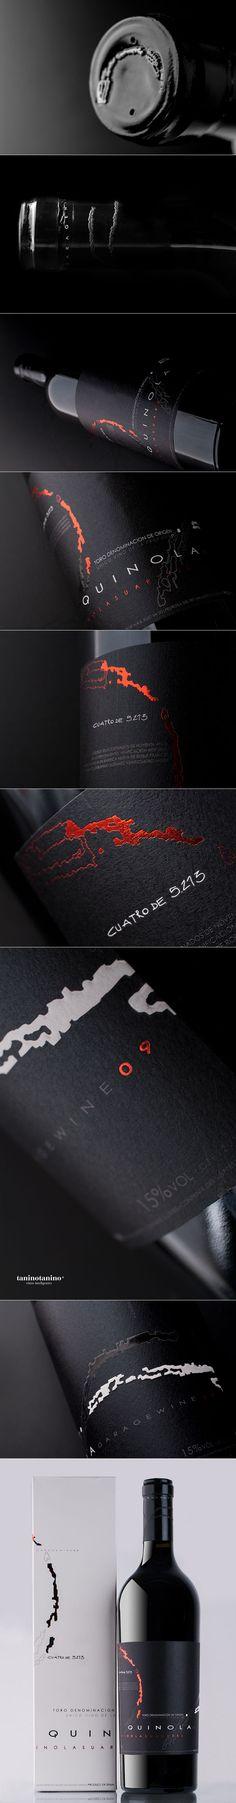 QUINOLA 2009  - TANINOTANINO VINOS INTELIGENTES wine / vinho / vino PD